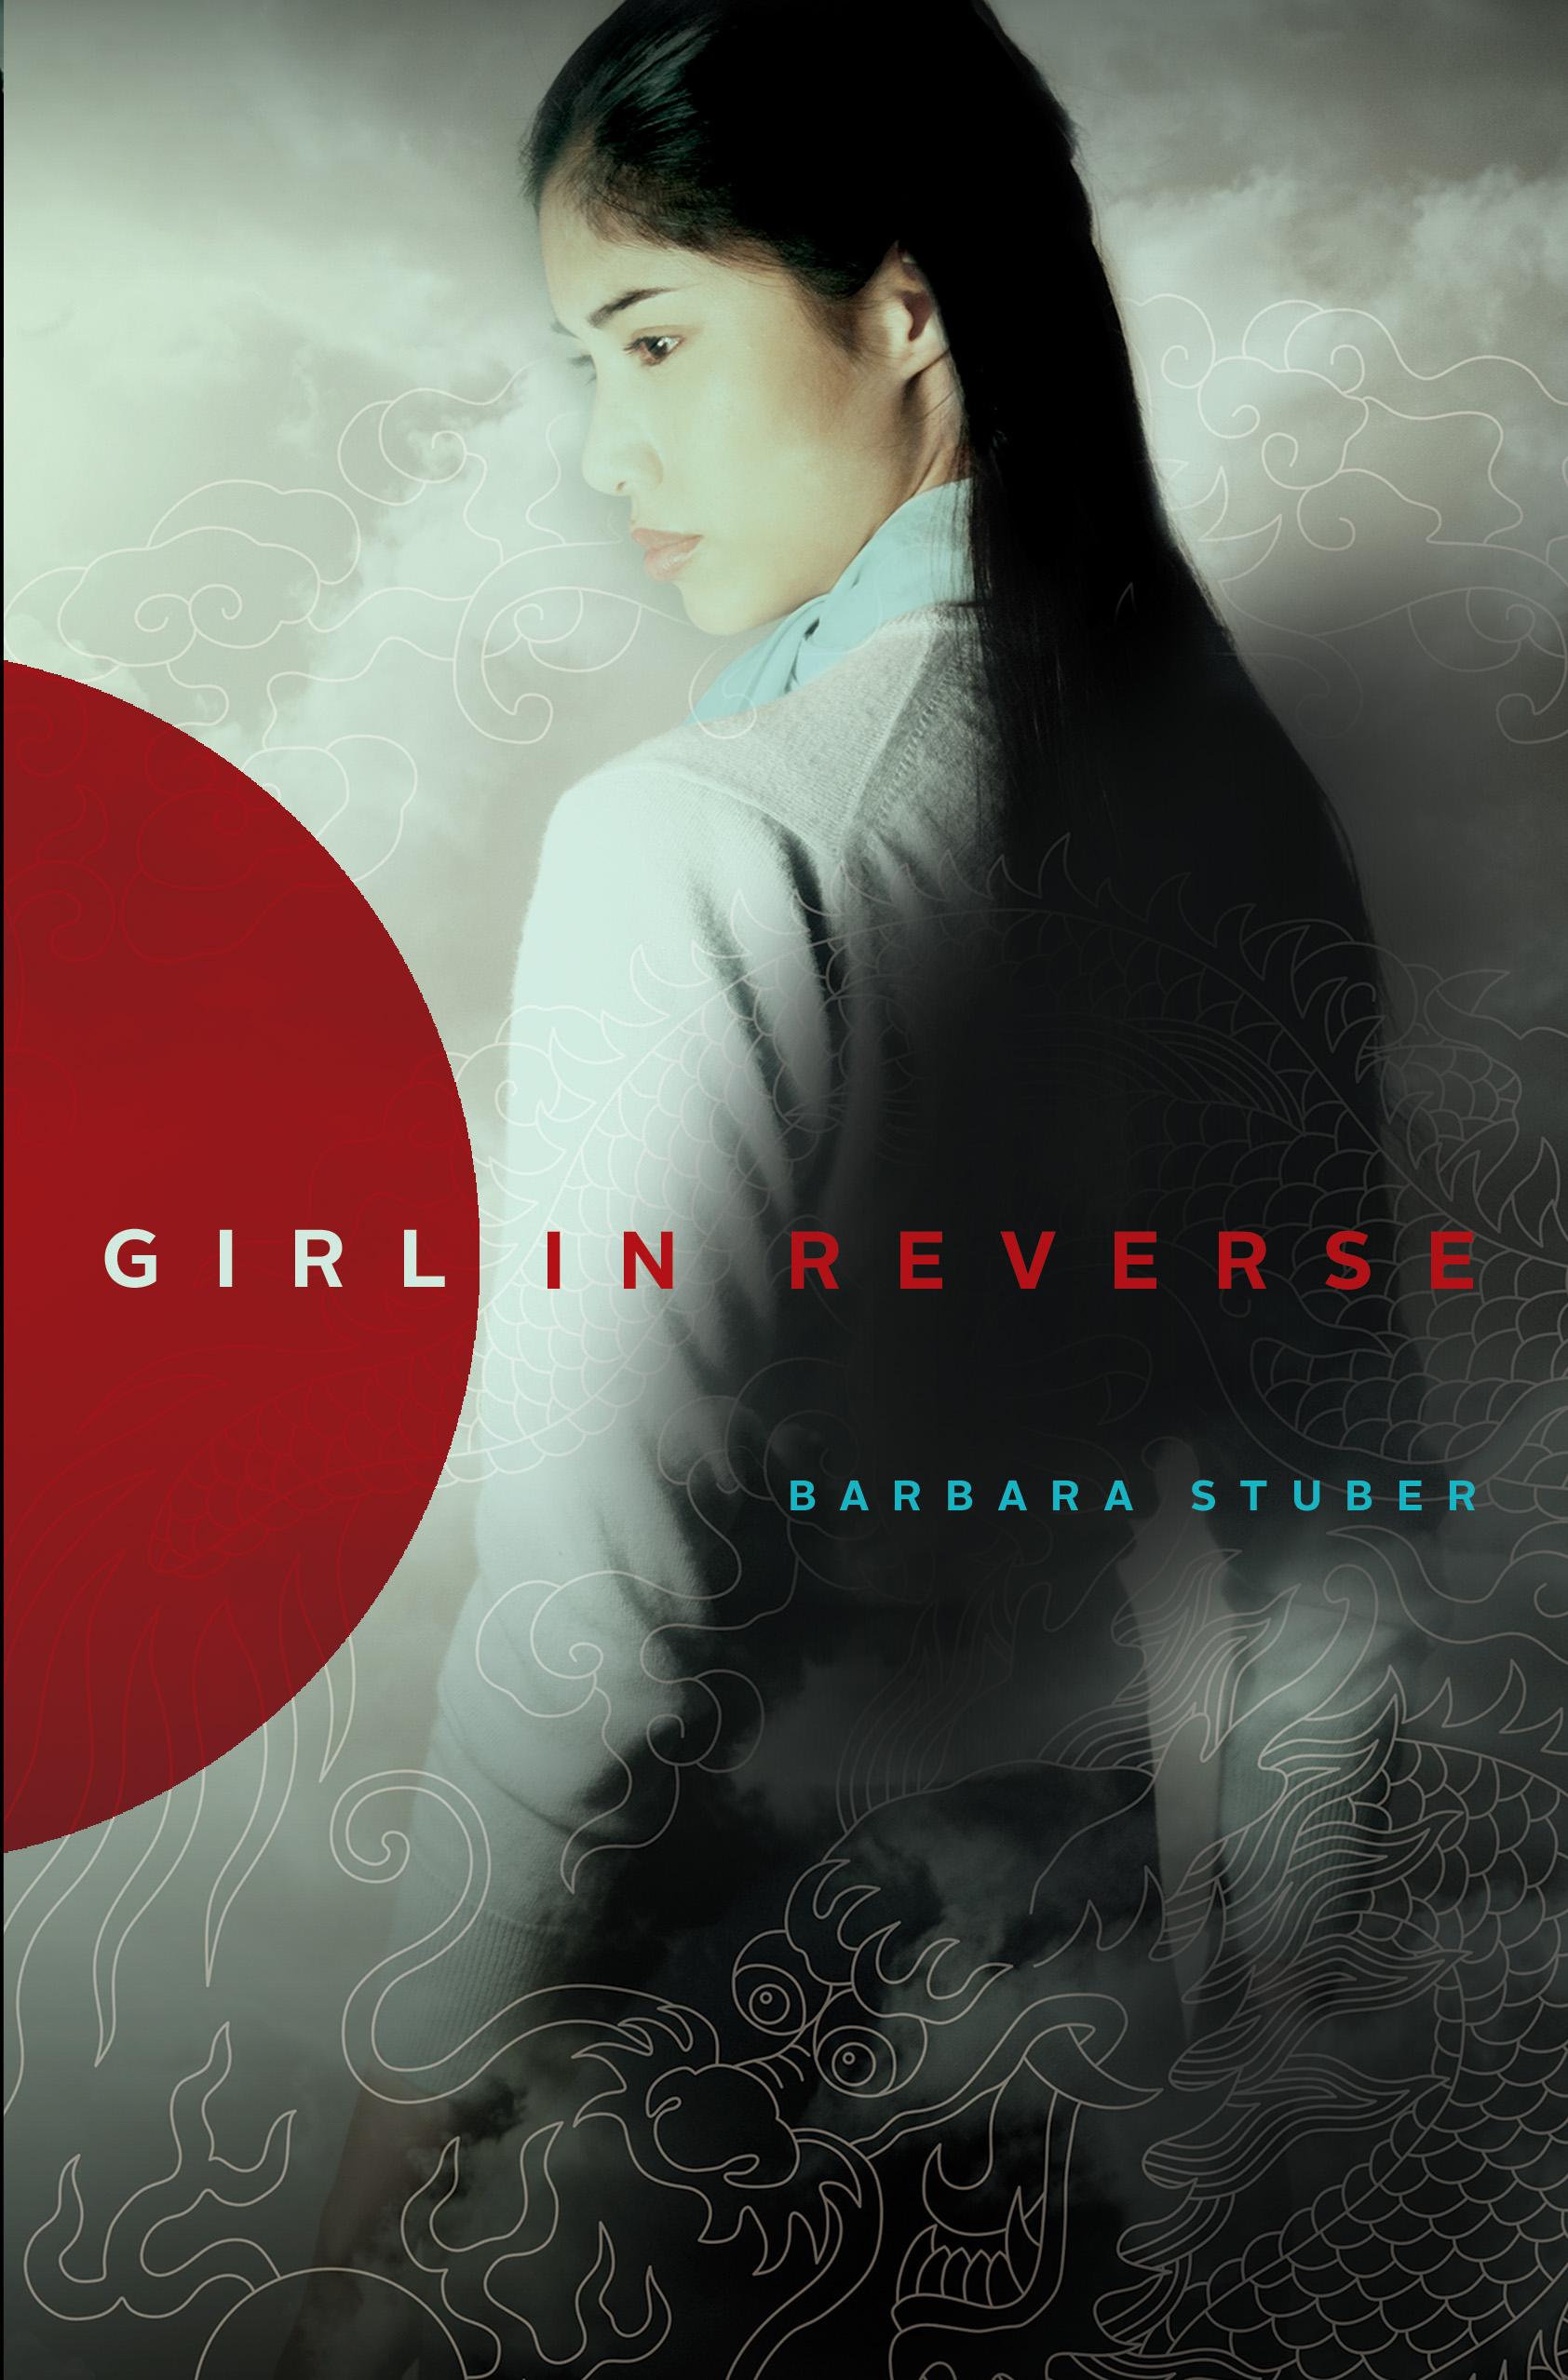 Girl in reverse 9781442497344 hr